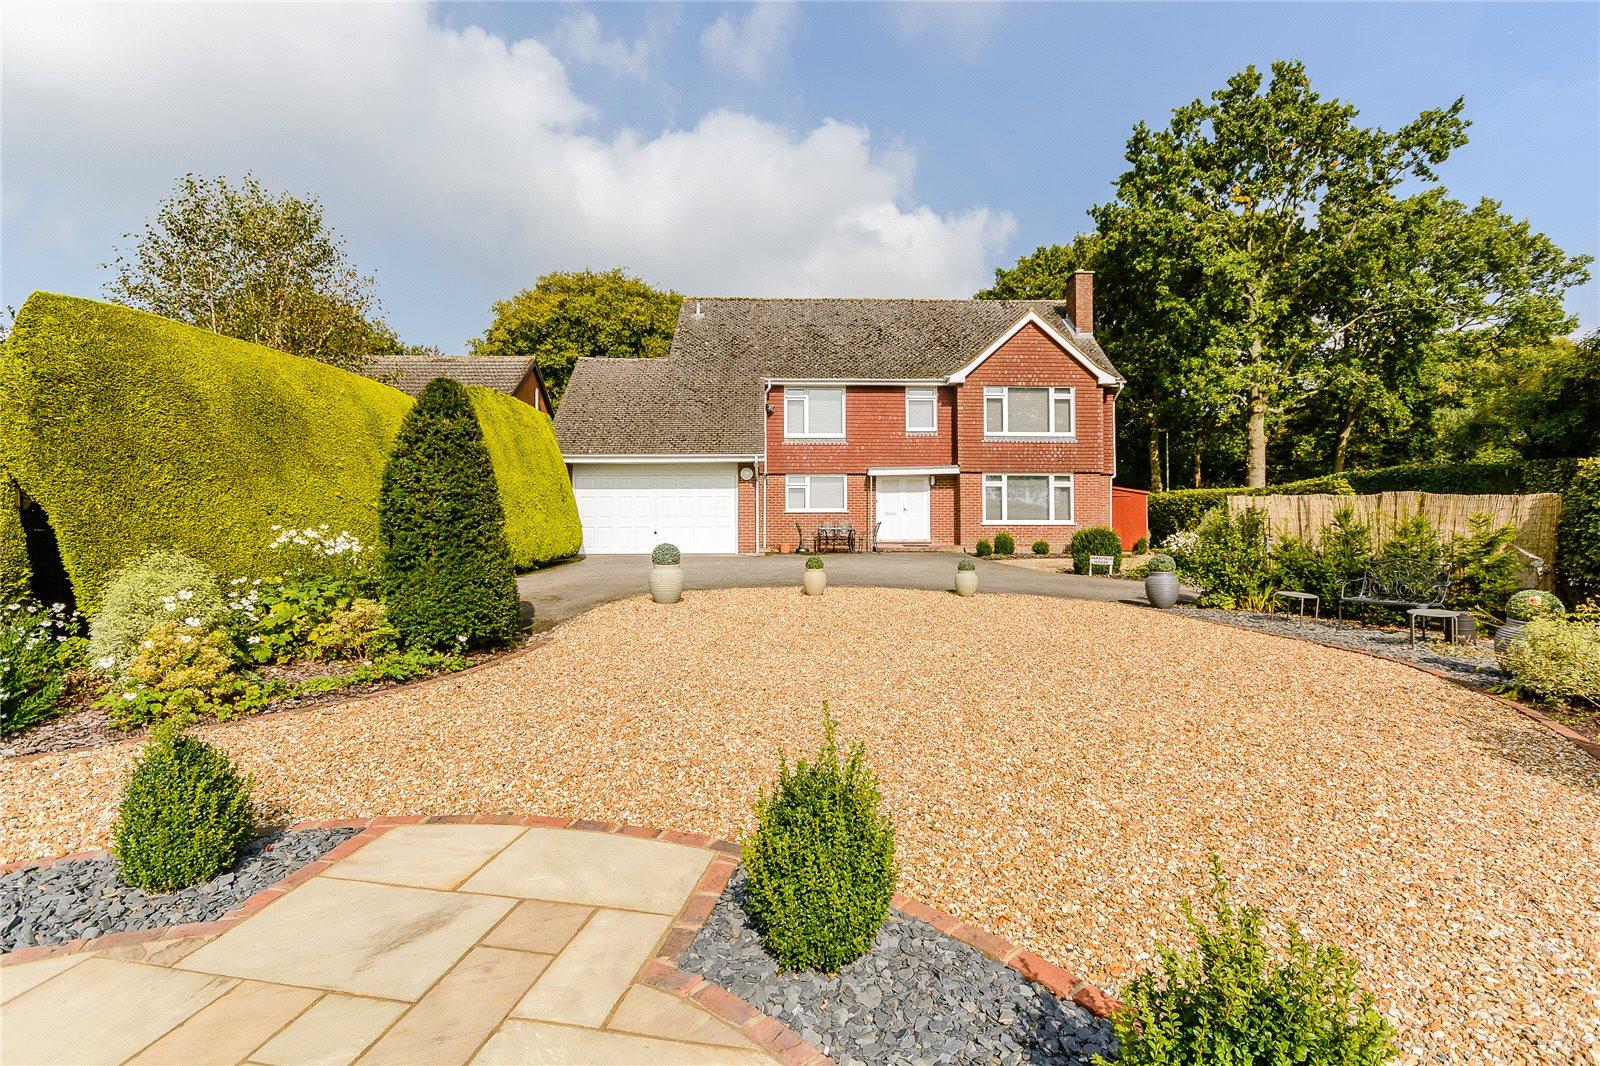 Single Family Home For Sale At Upper Old Park Lane Farnham Surrey GU9